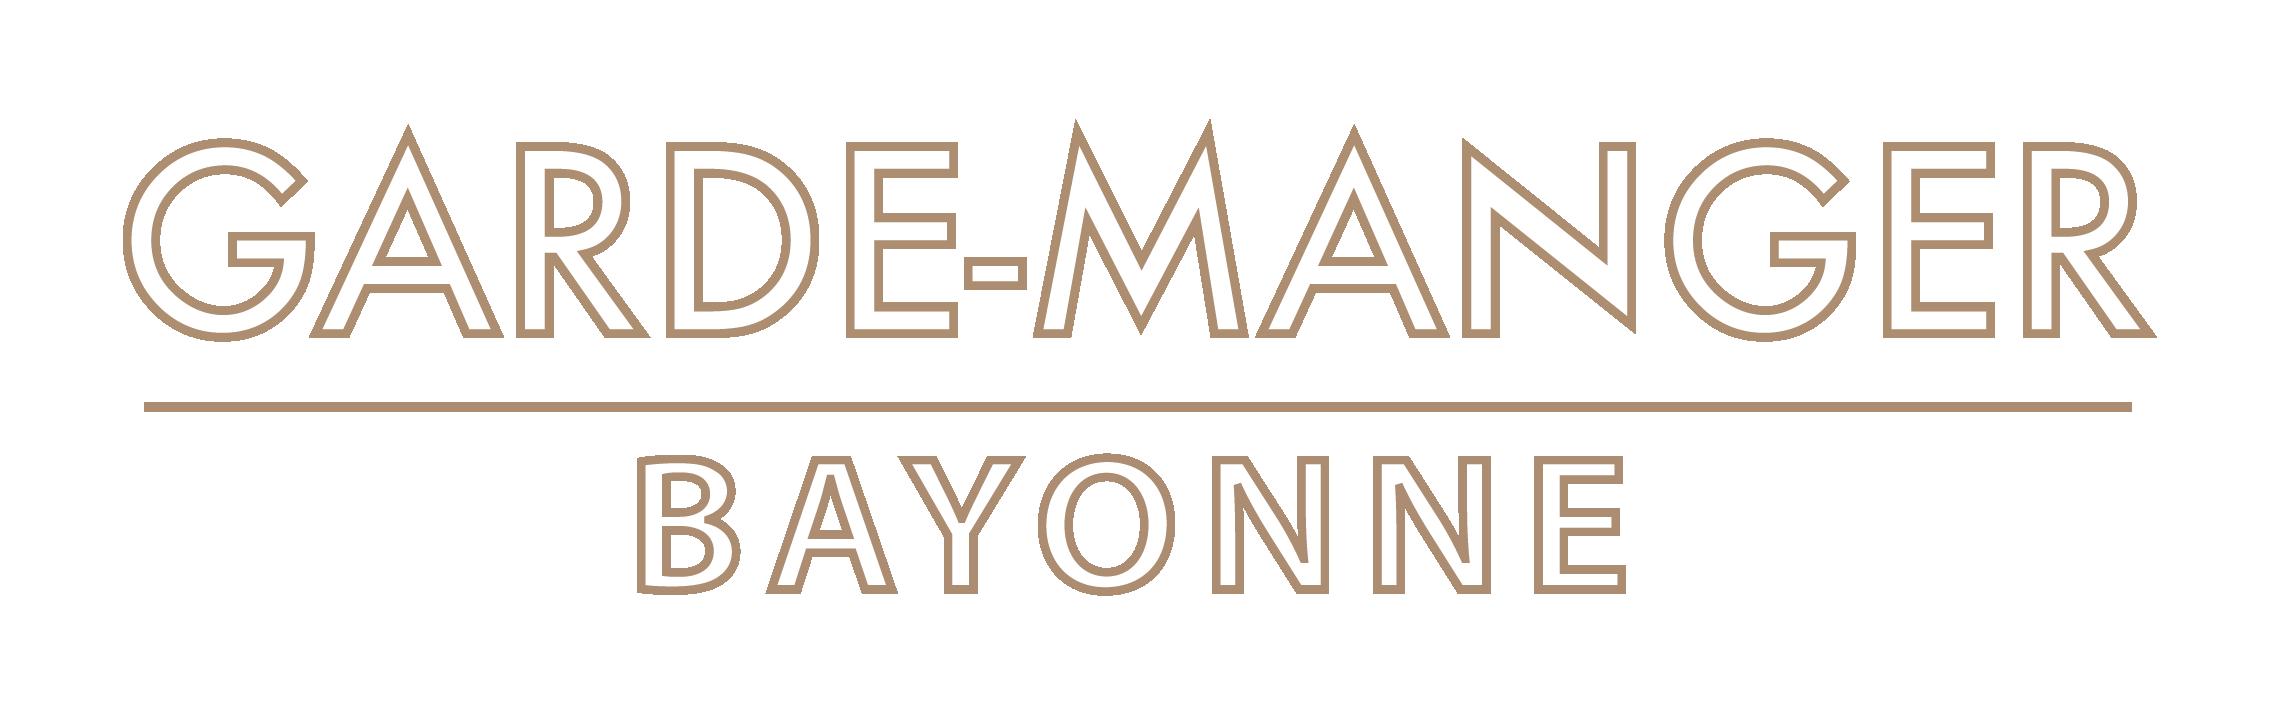 logo - garde manger bayonne - restaurant bayonne